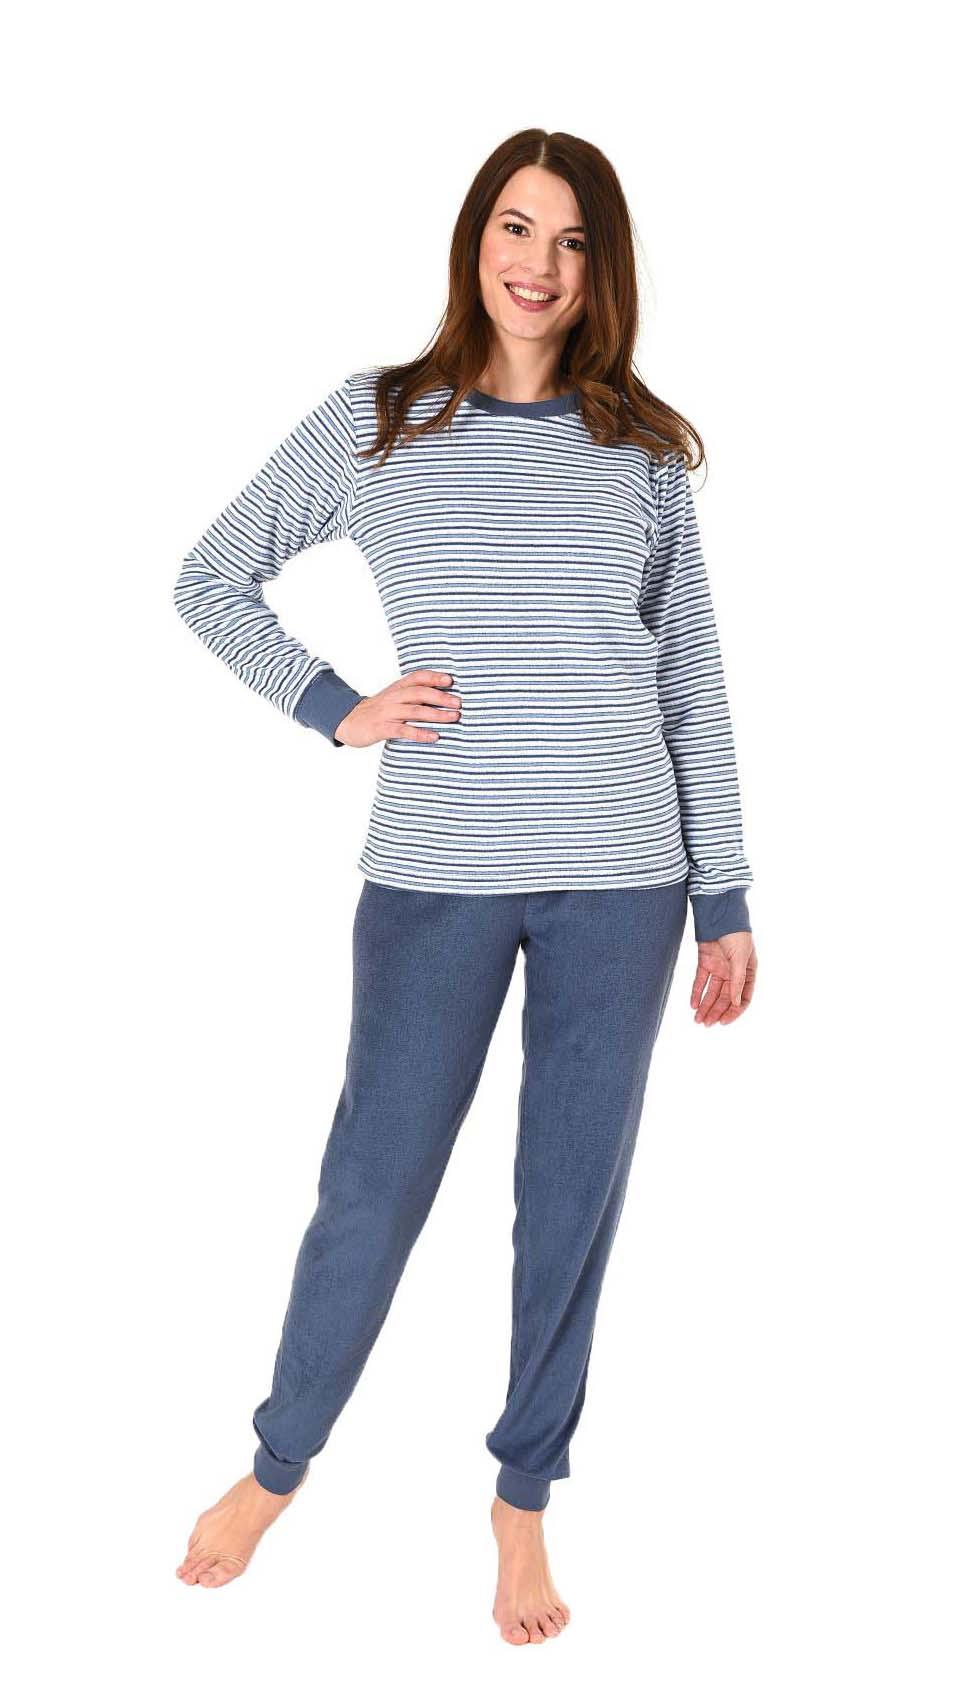 Damen Frottee Pyjama lang mit Bündchen - 61237 – Bild 1